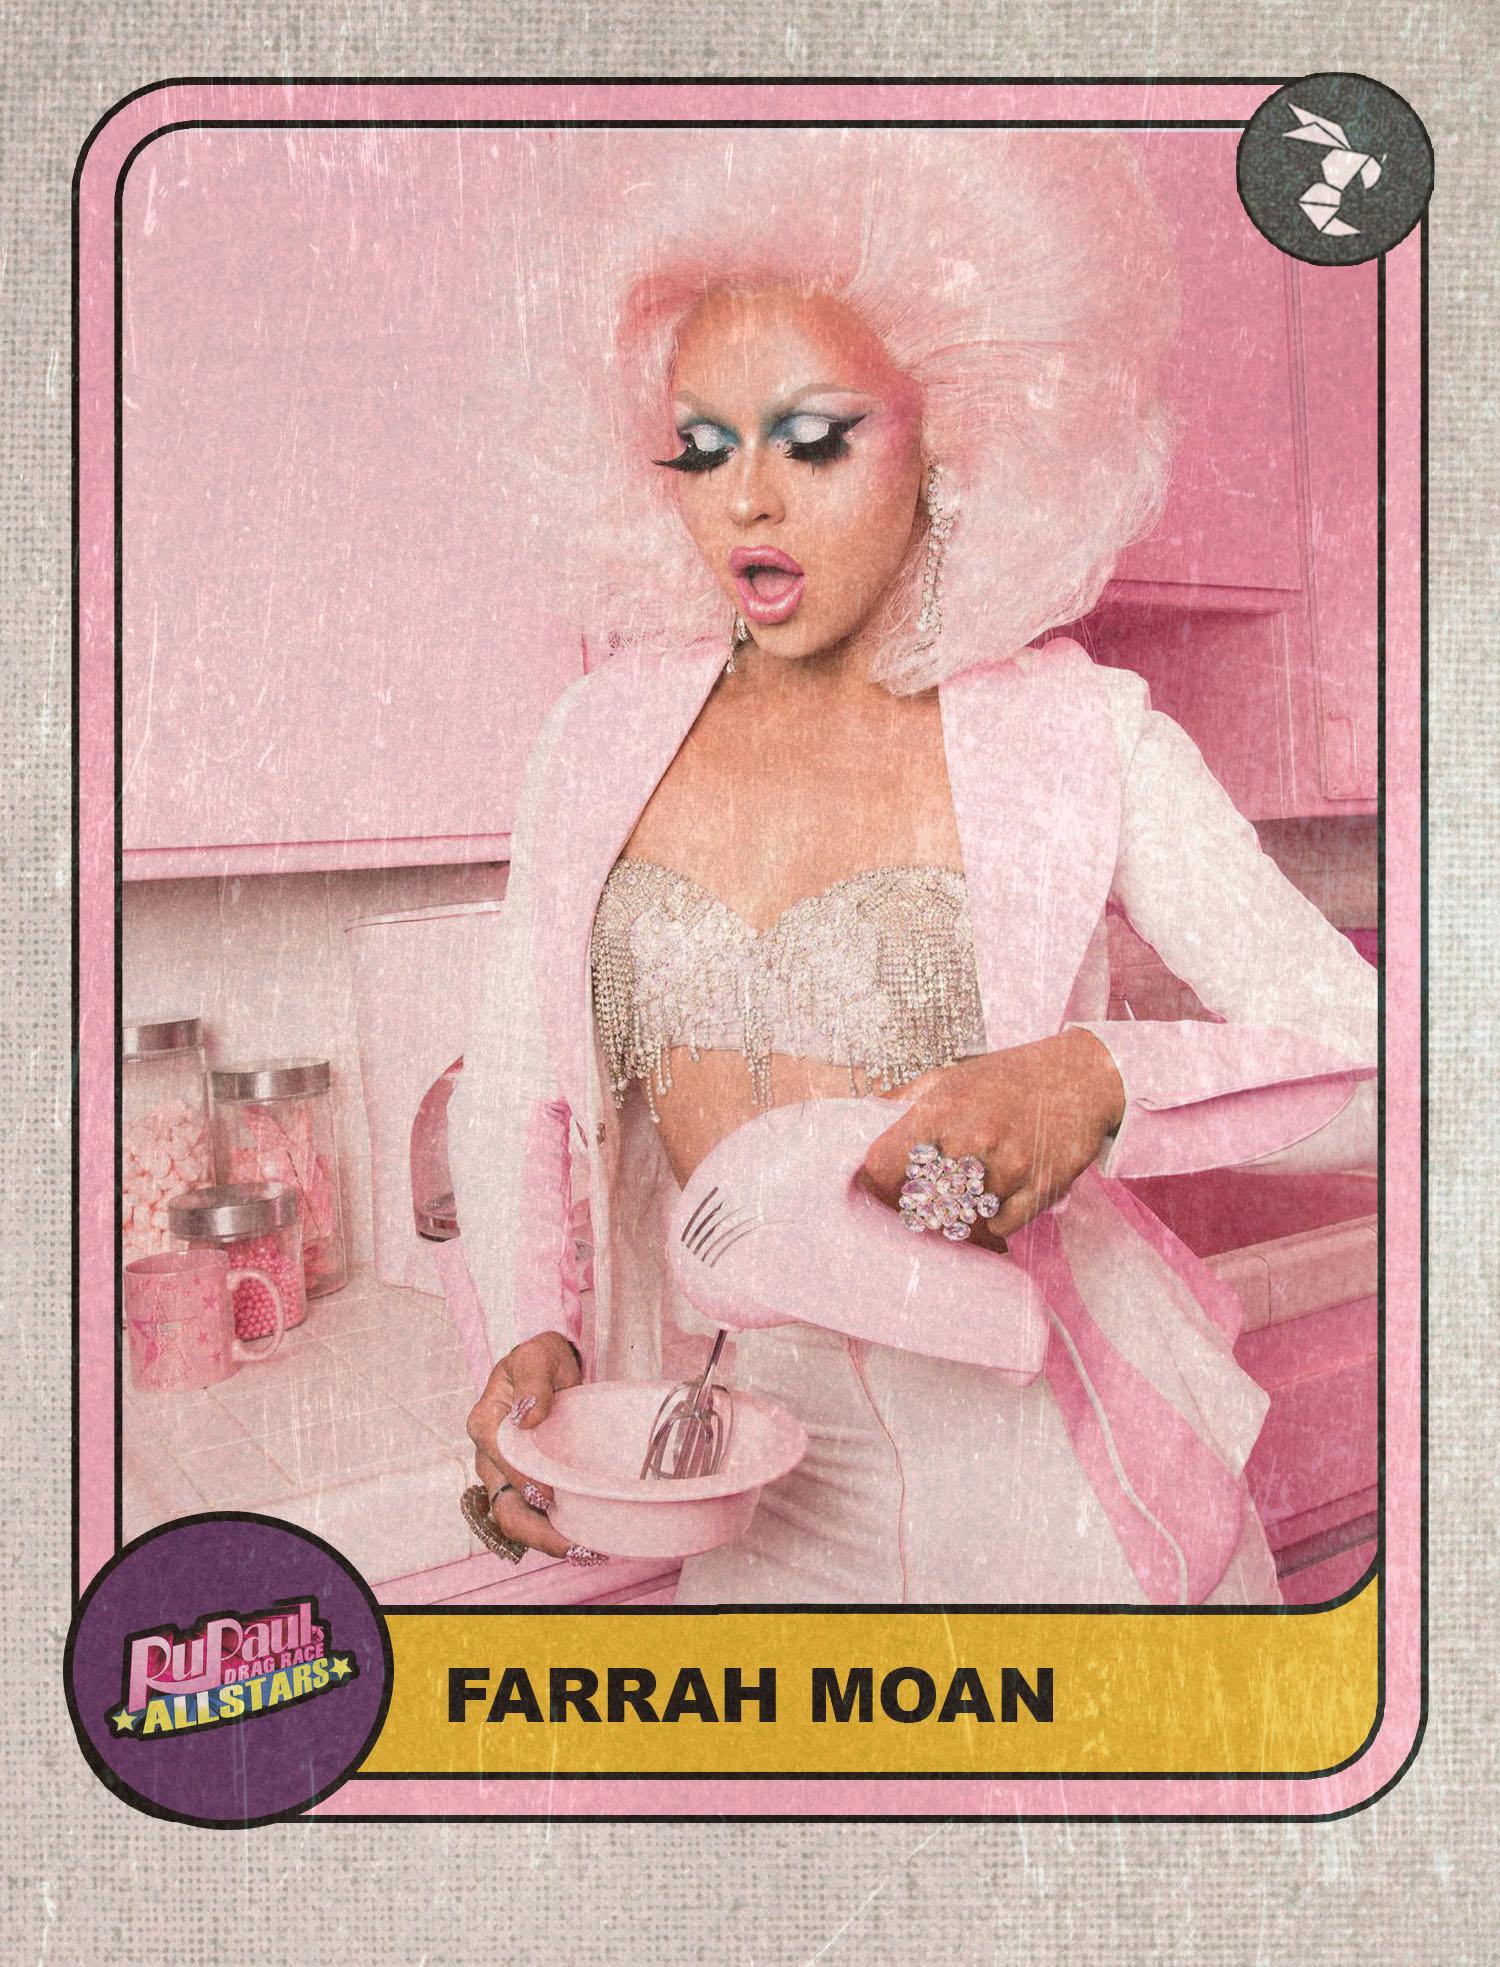 farrah moan all stars hornet